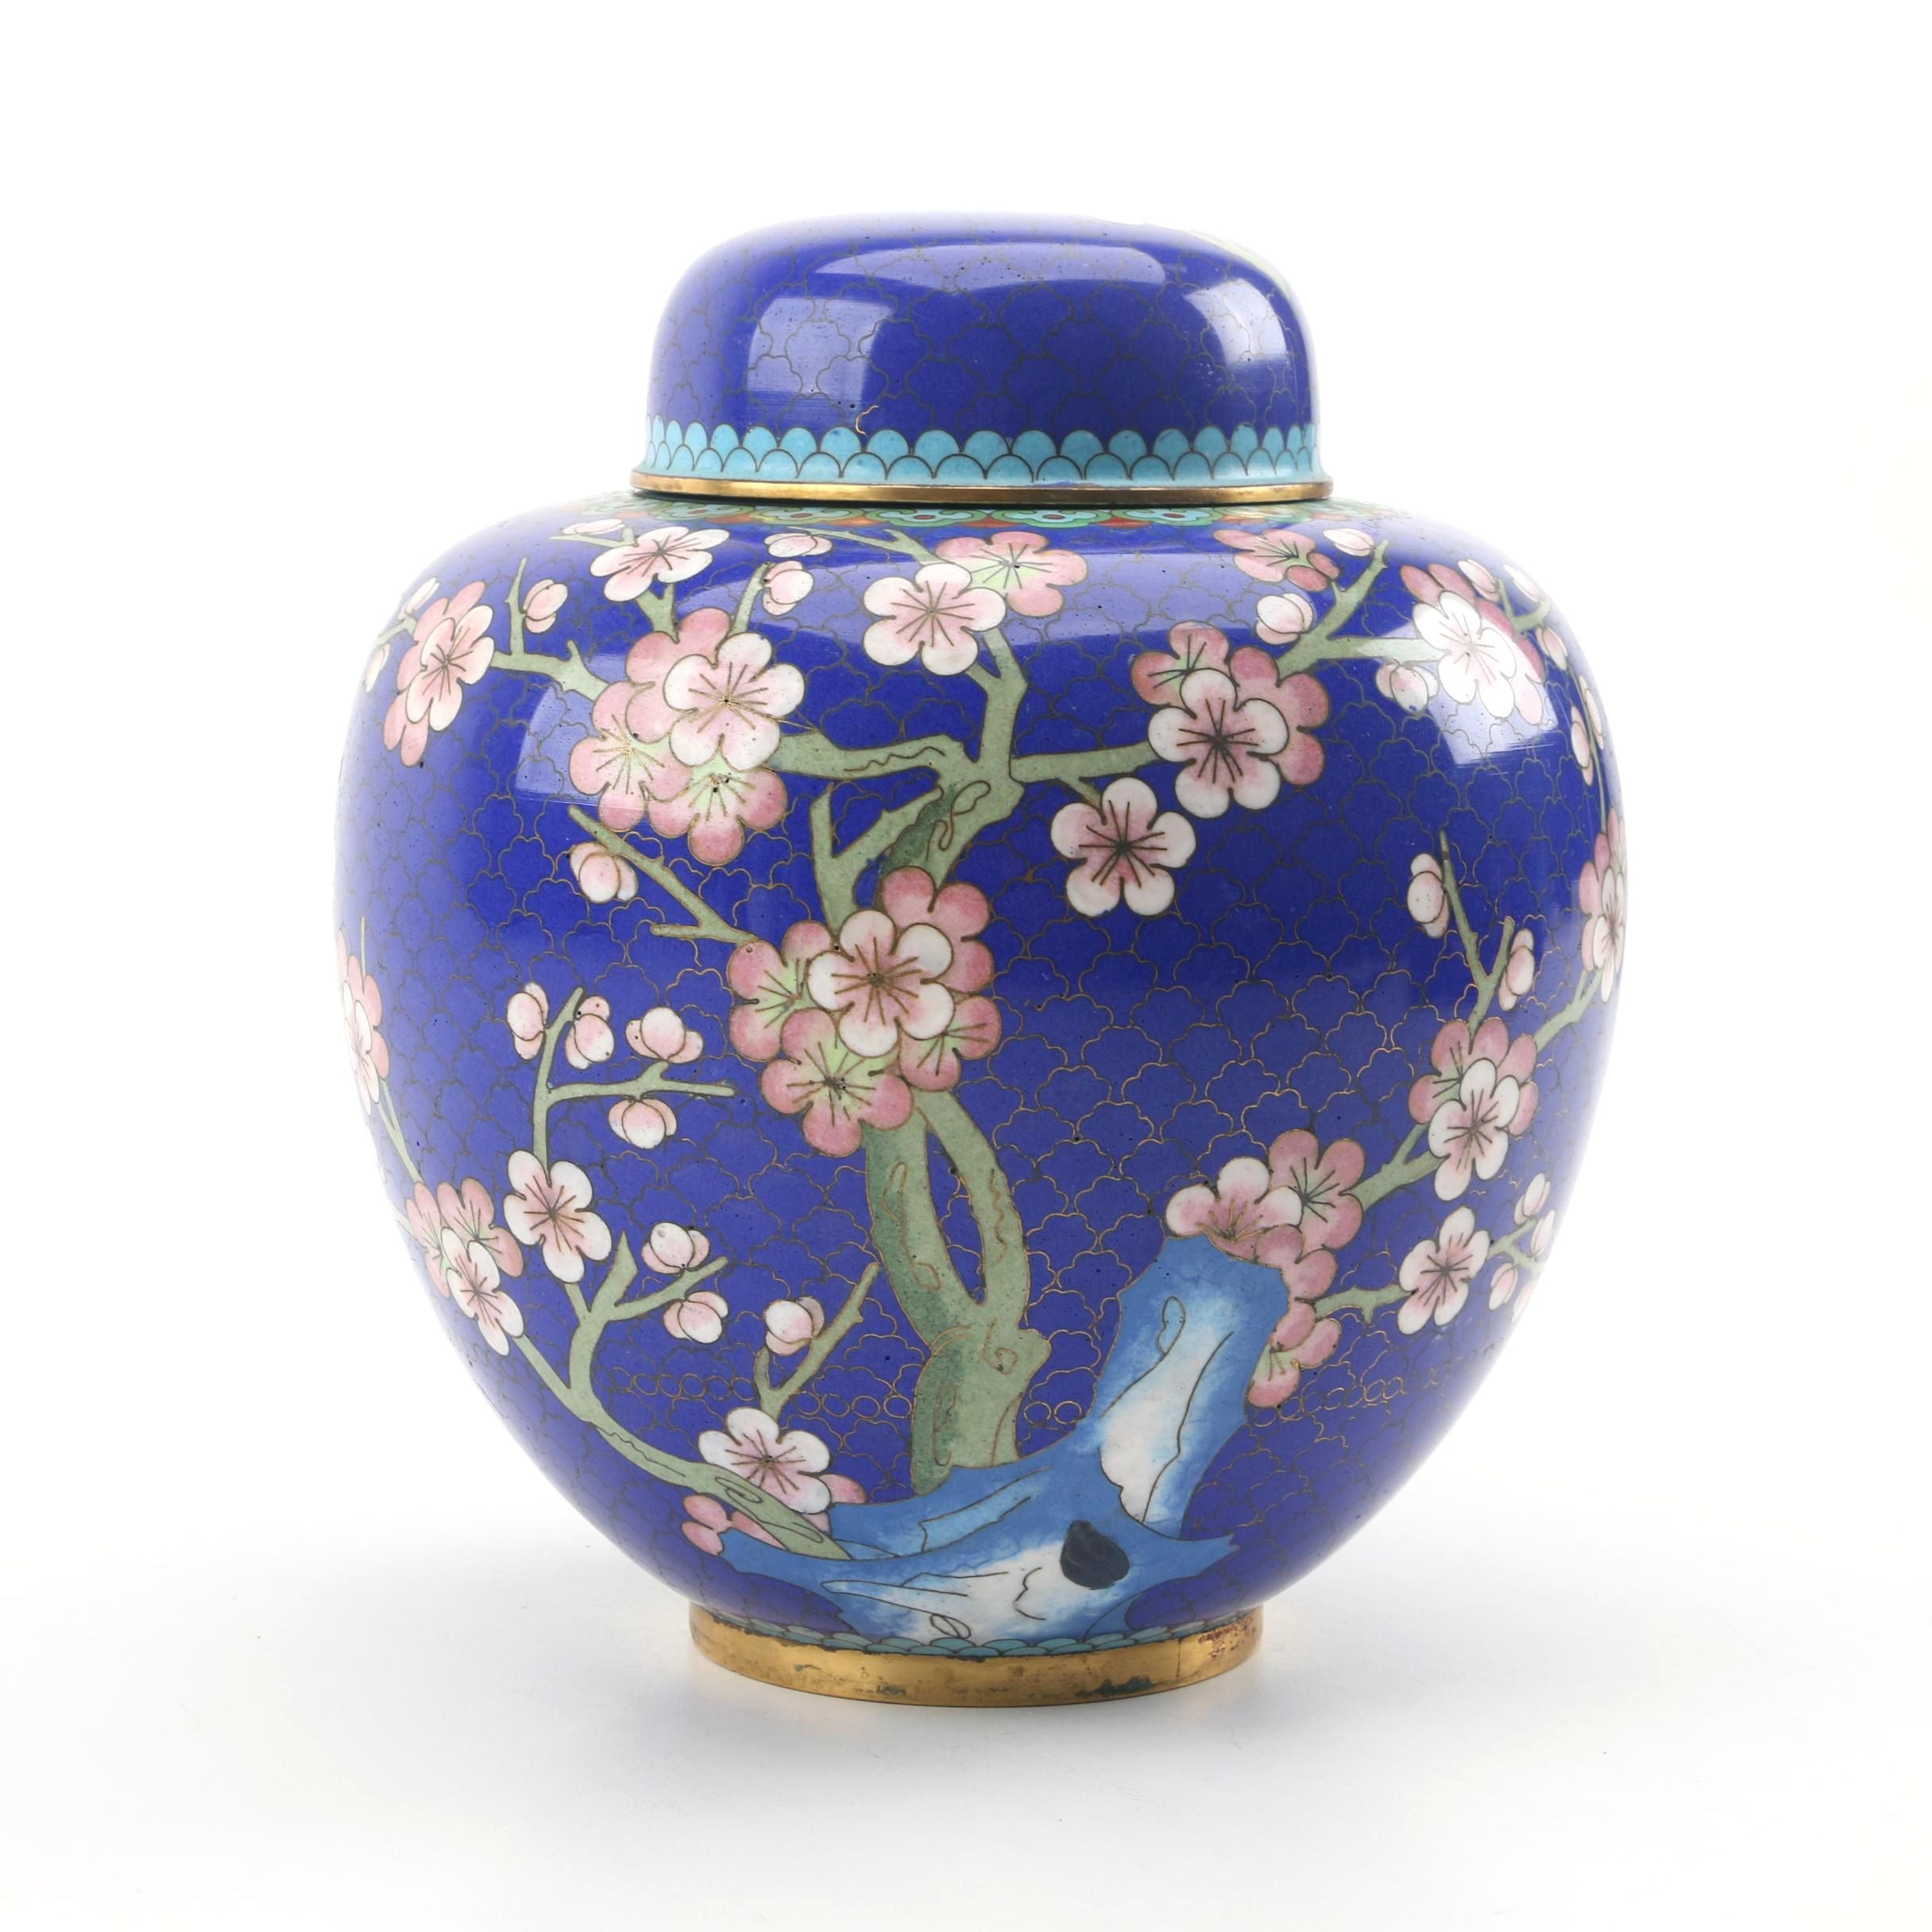 Chinese Plum Blossom Cloisonné Ginger Jar